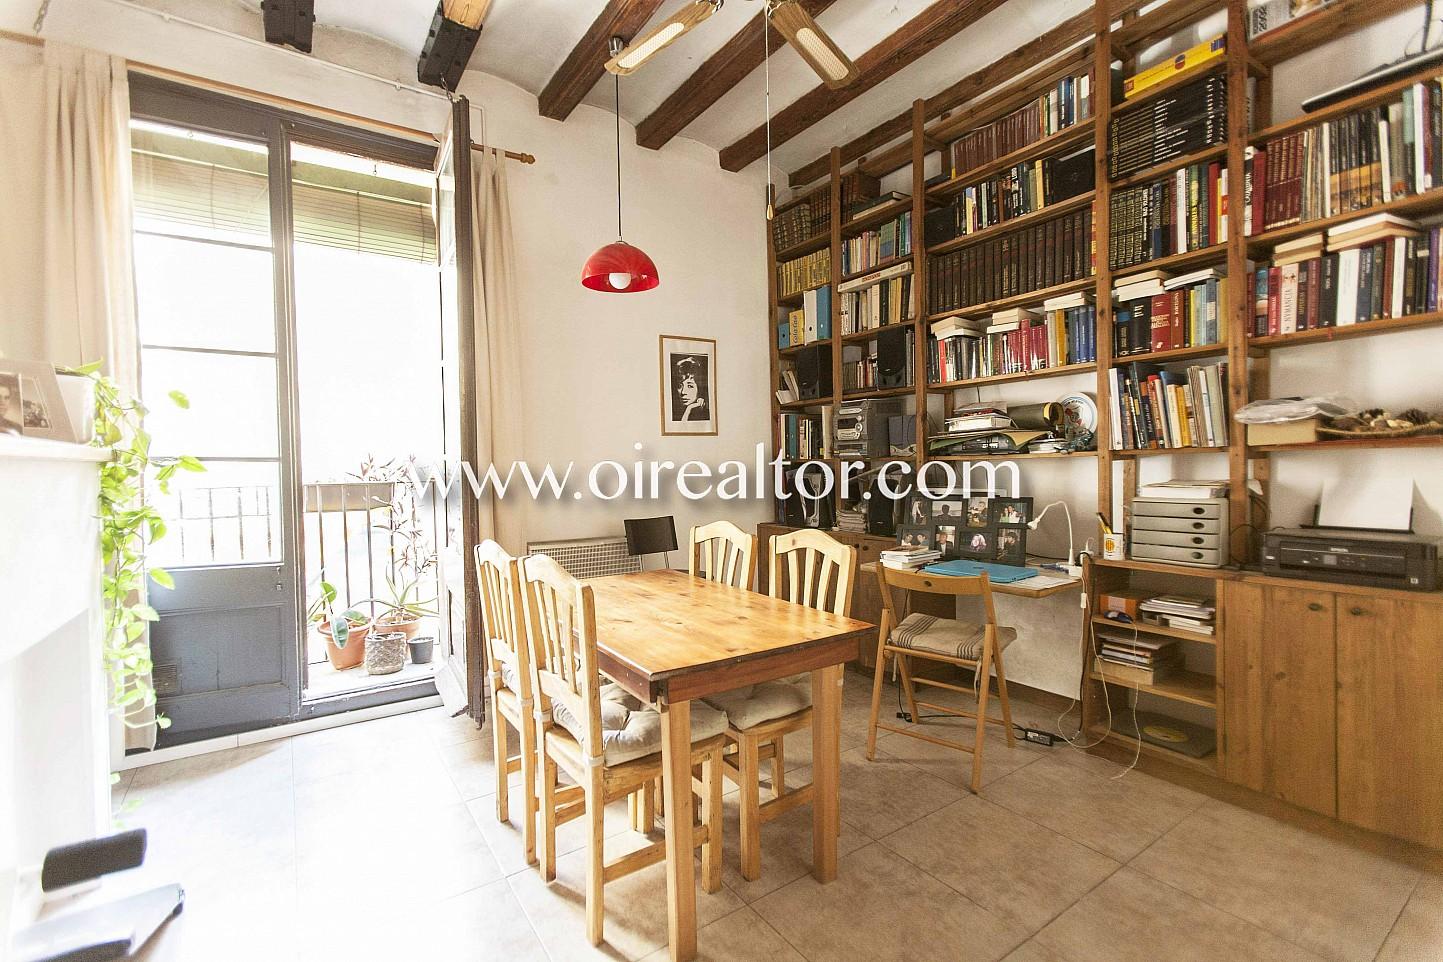 despacho, librería, terraza, vistas a la calle, mesa de comedor